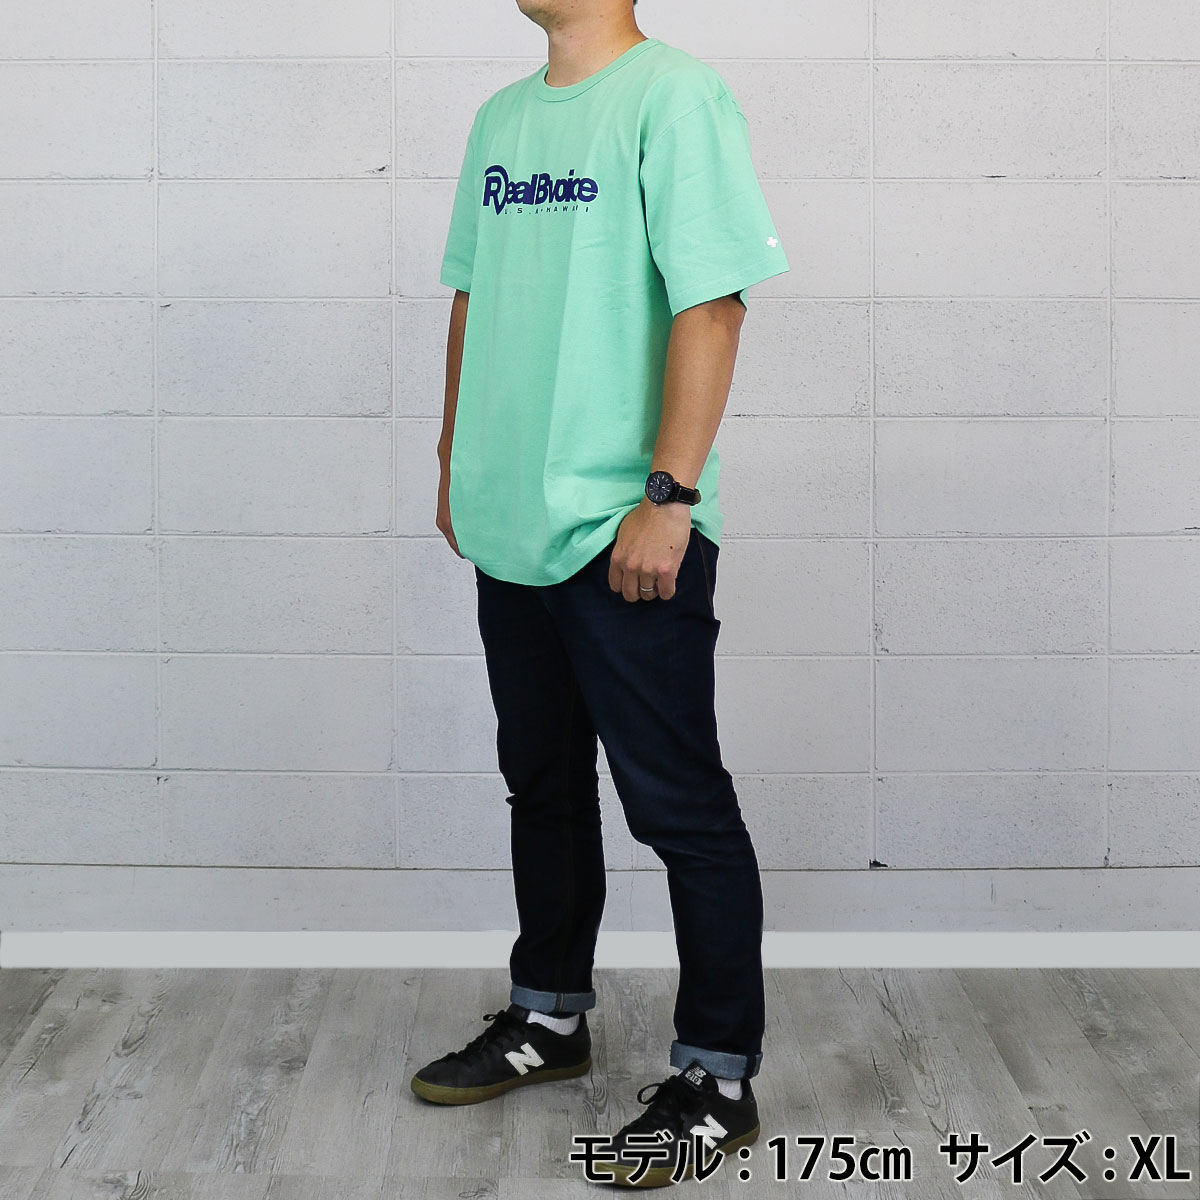 HEAVY WEIGHT BASIC LOGO T-SHIRT